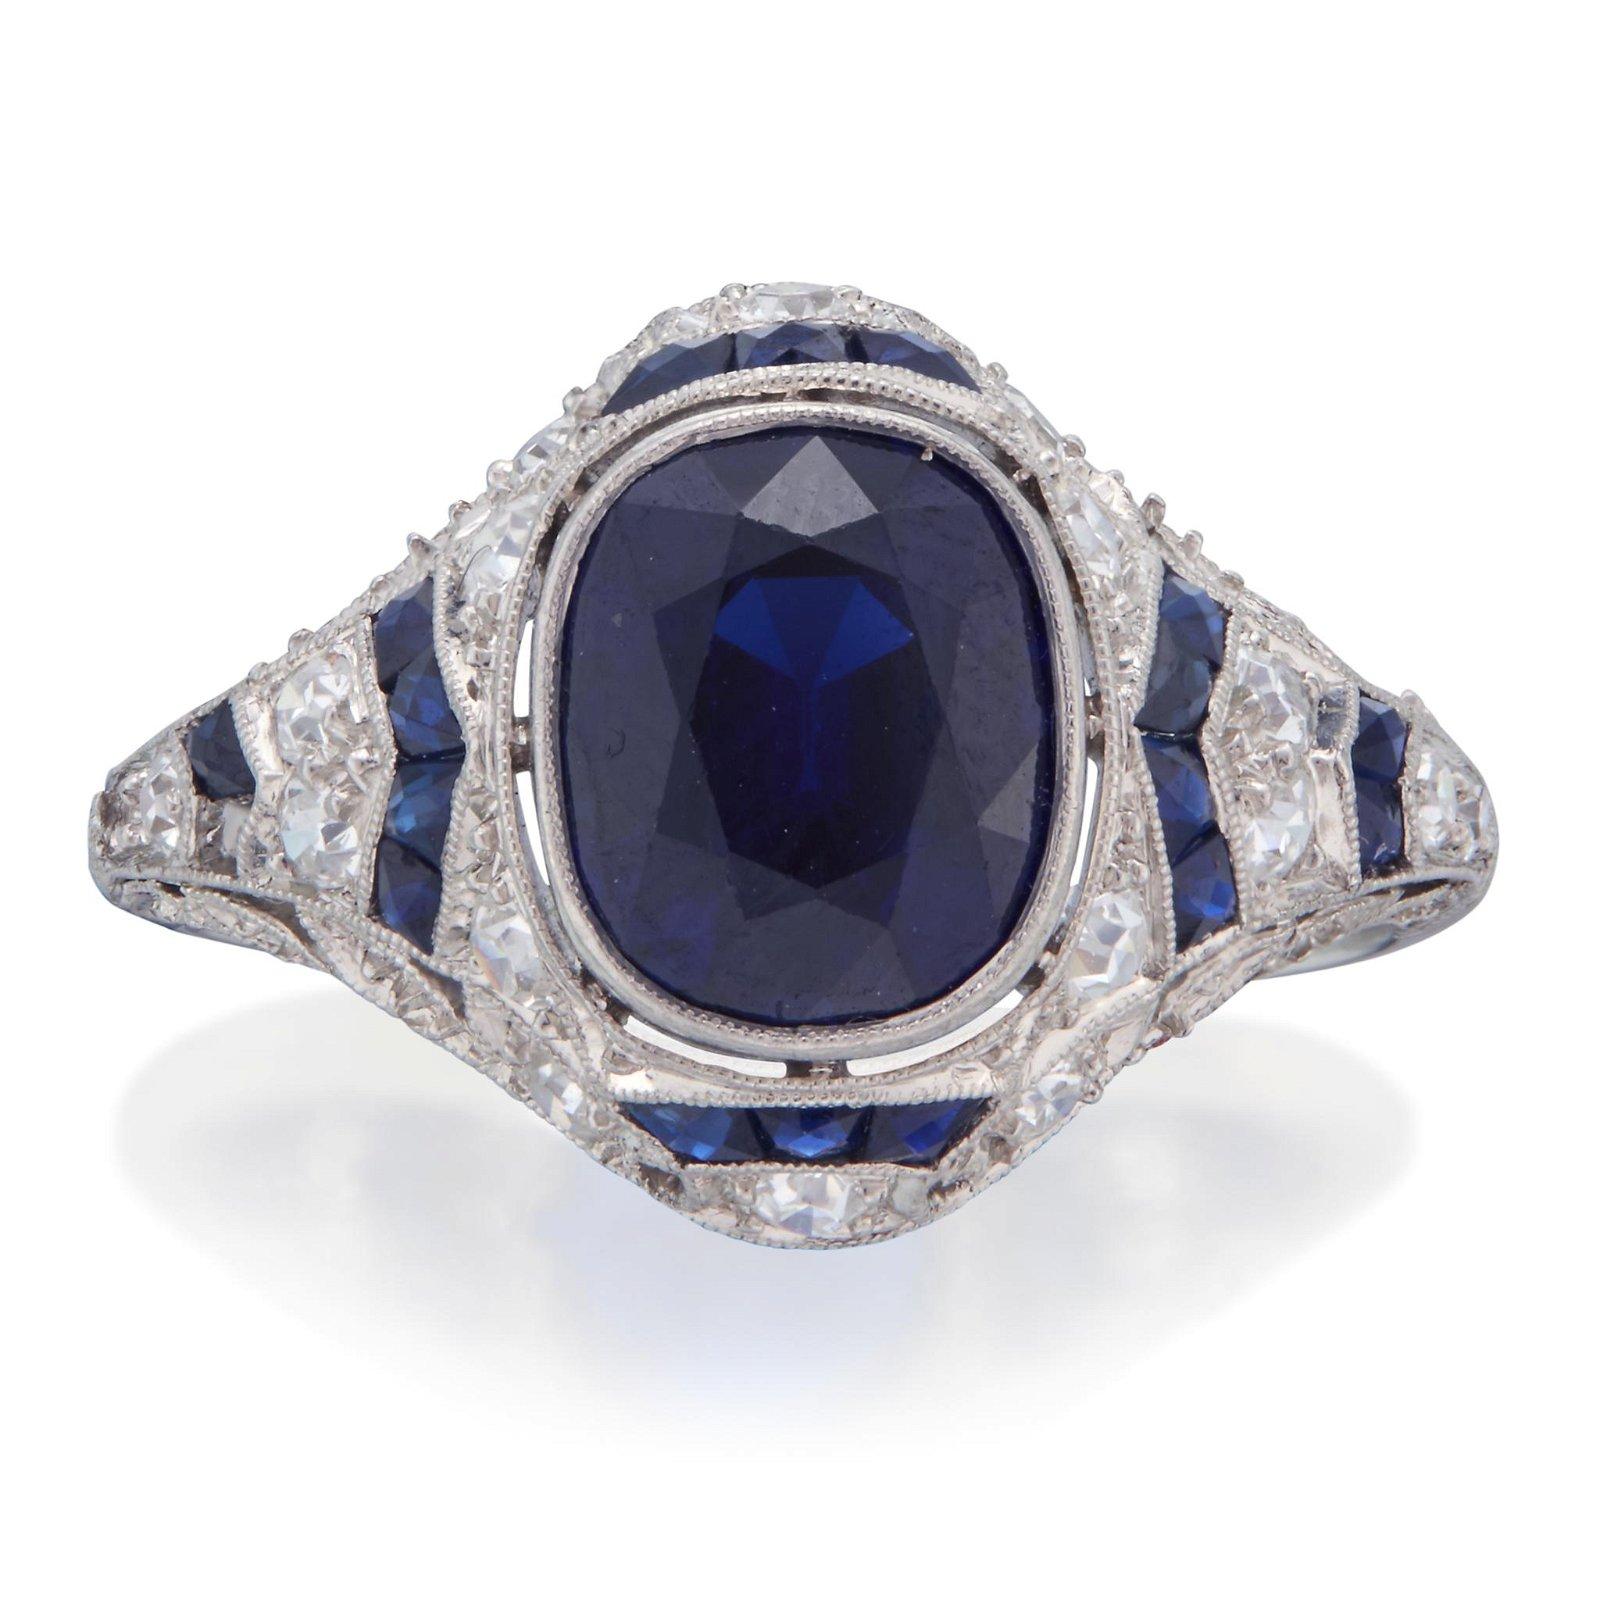 An Art Deco diamond, sapphire, and platinum ring,